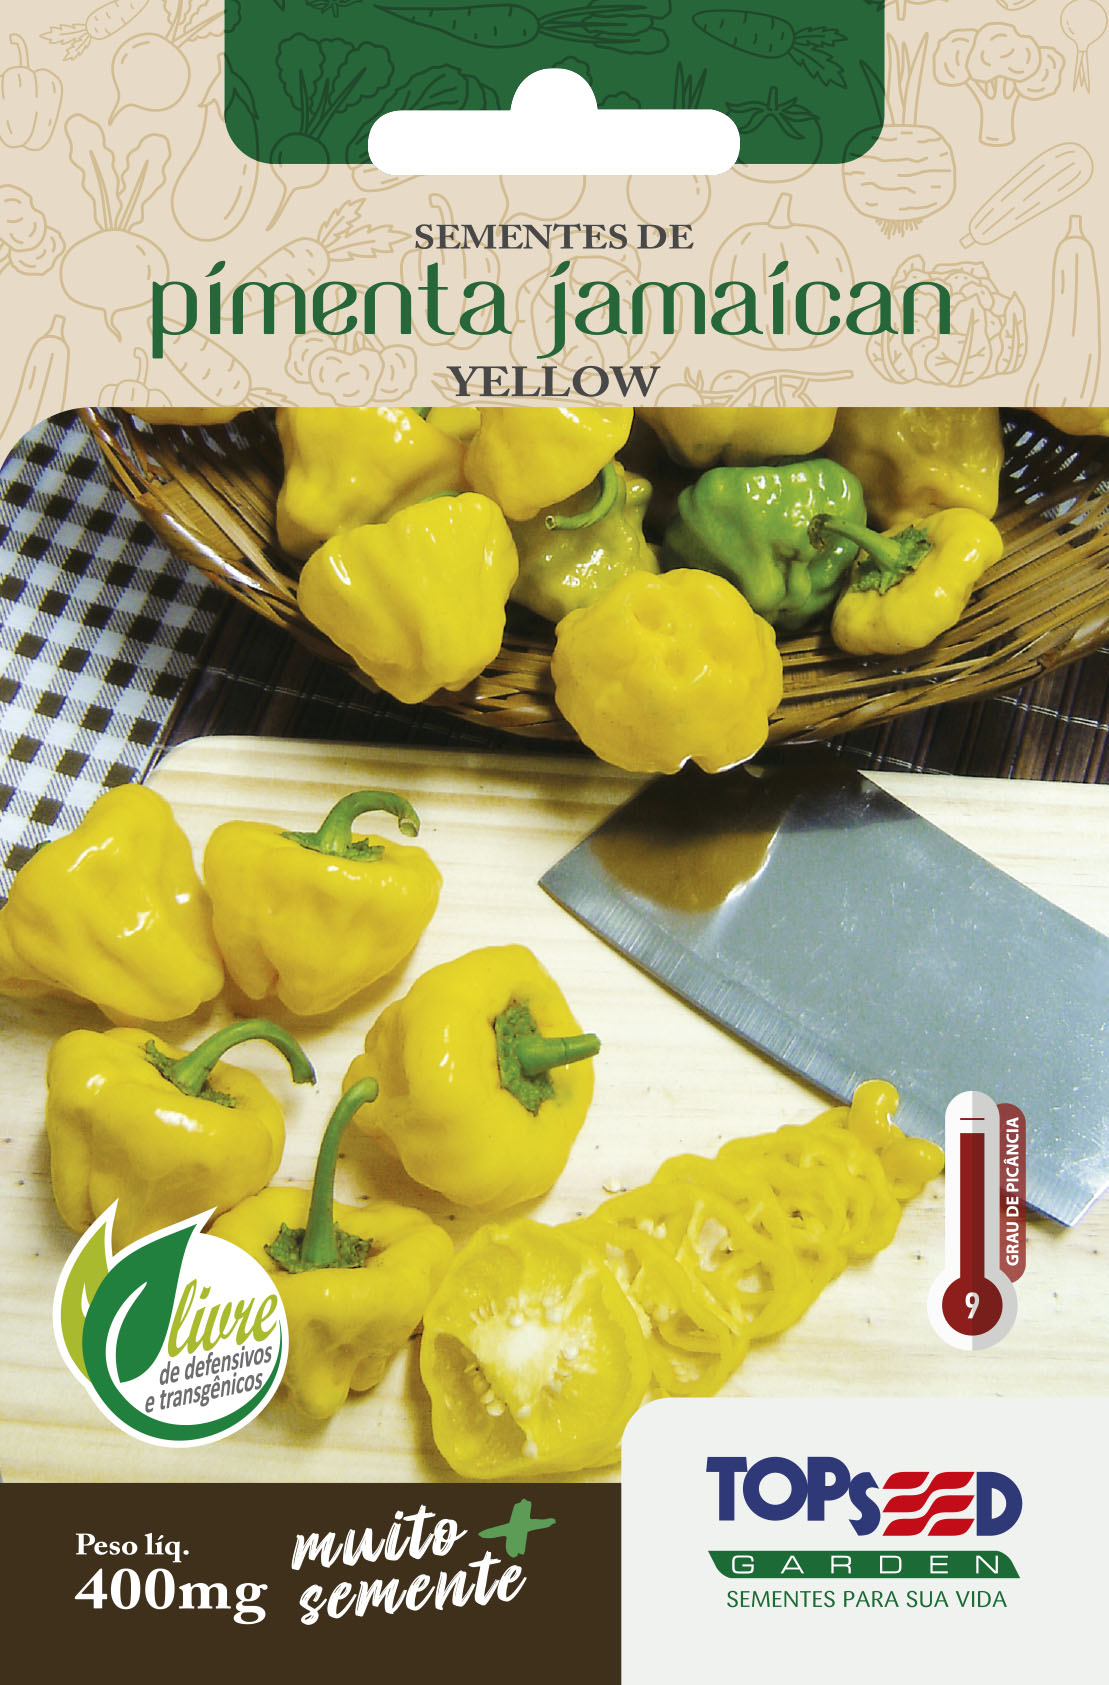 PIMENTA JAMAICAN YELLOW